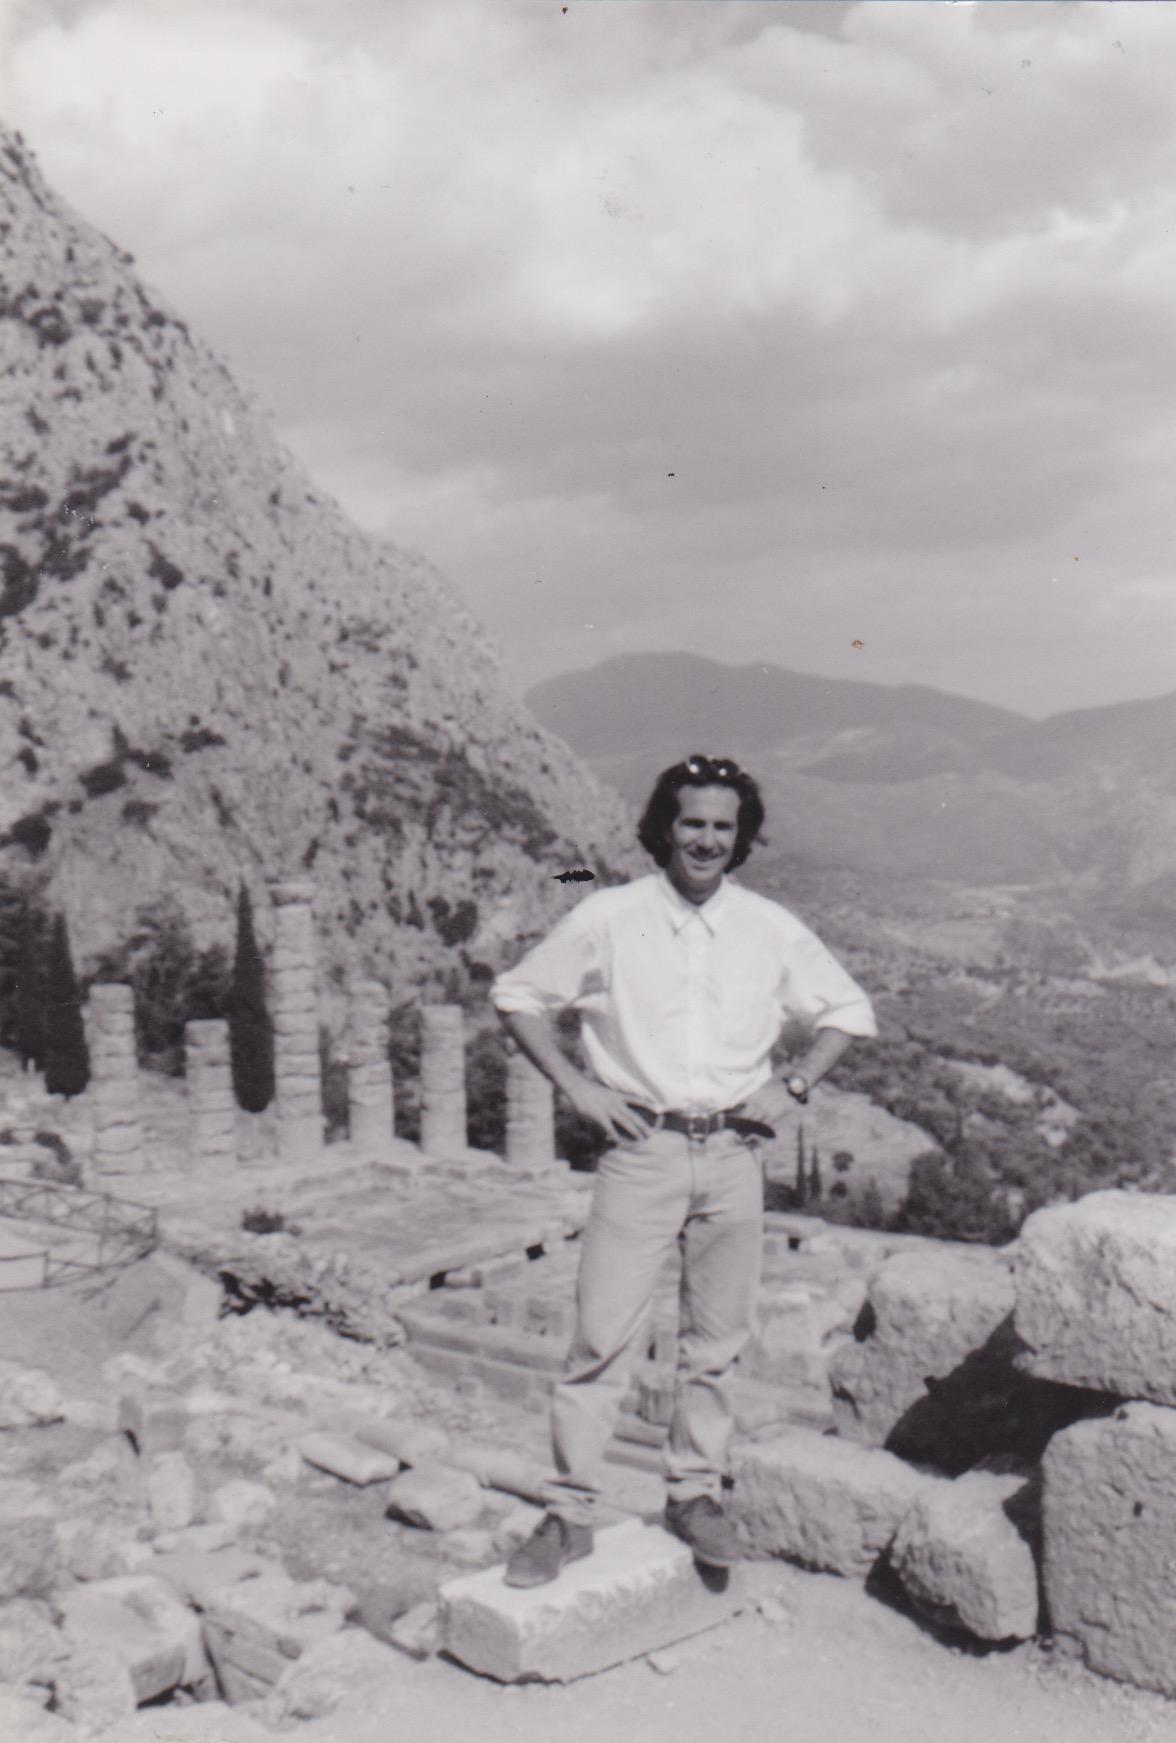 1995 Delphi, Greece